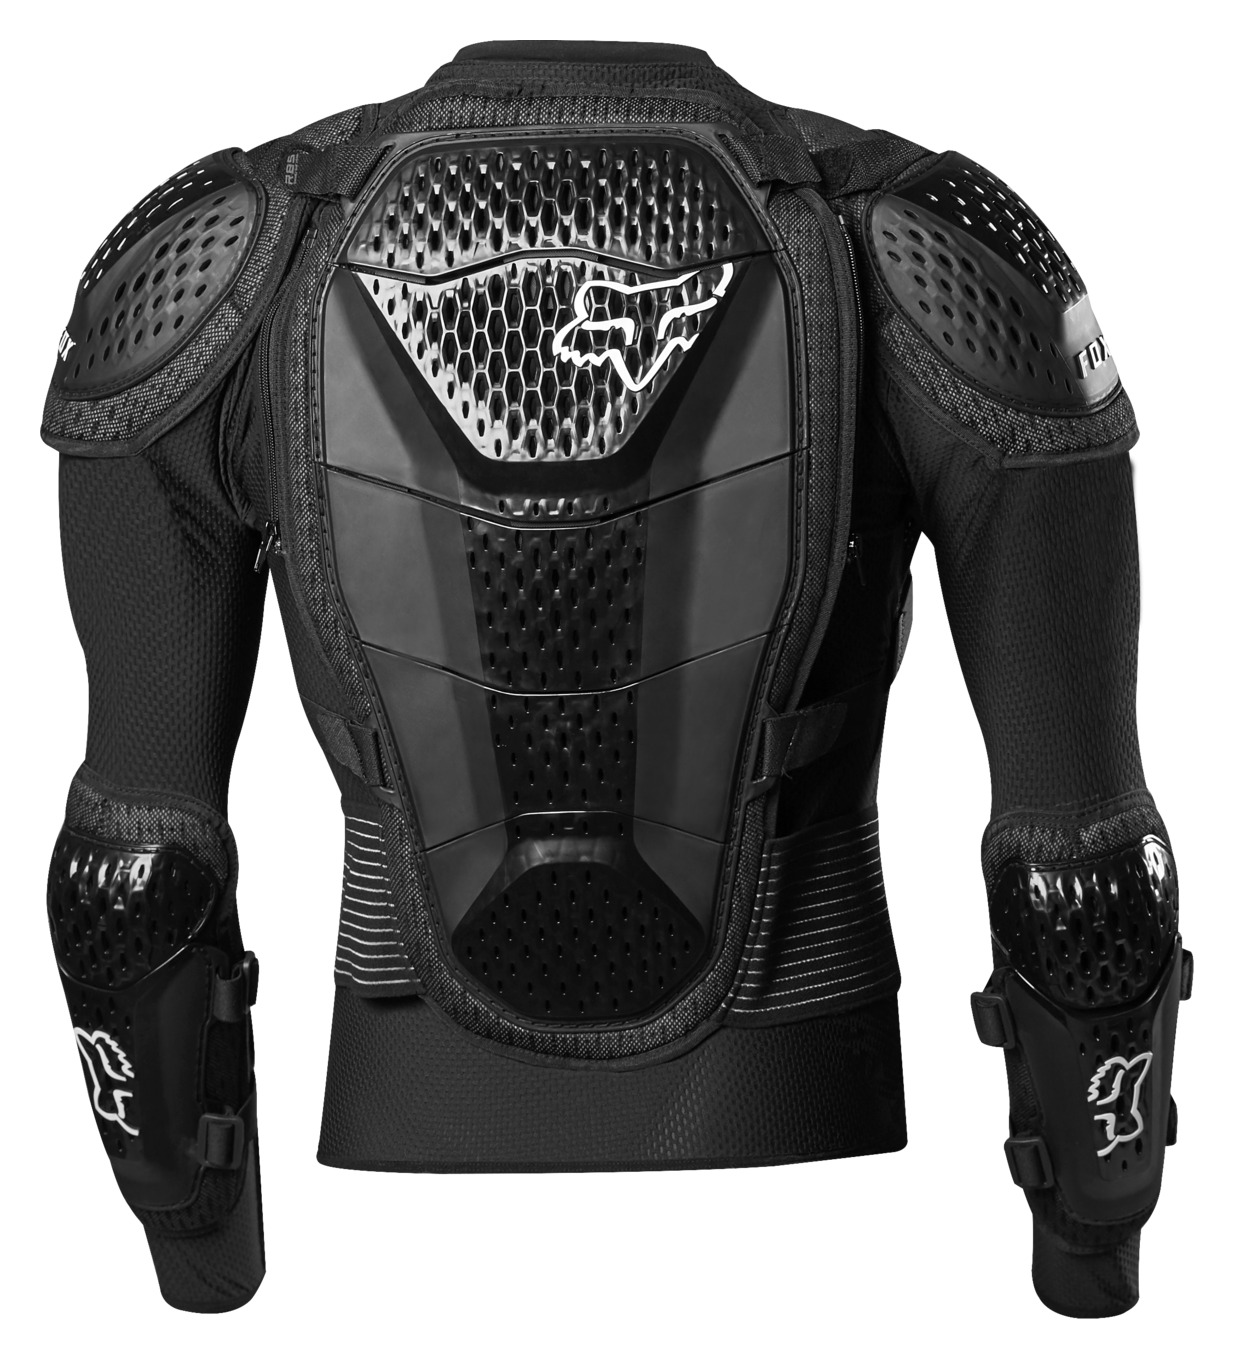 Black Fox Racing Titan Race Youth Elbow Guard MotoX Motorcycle Body Armor